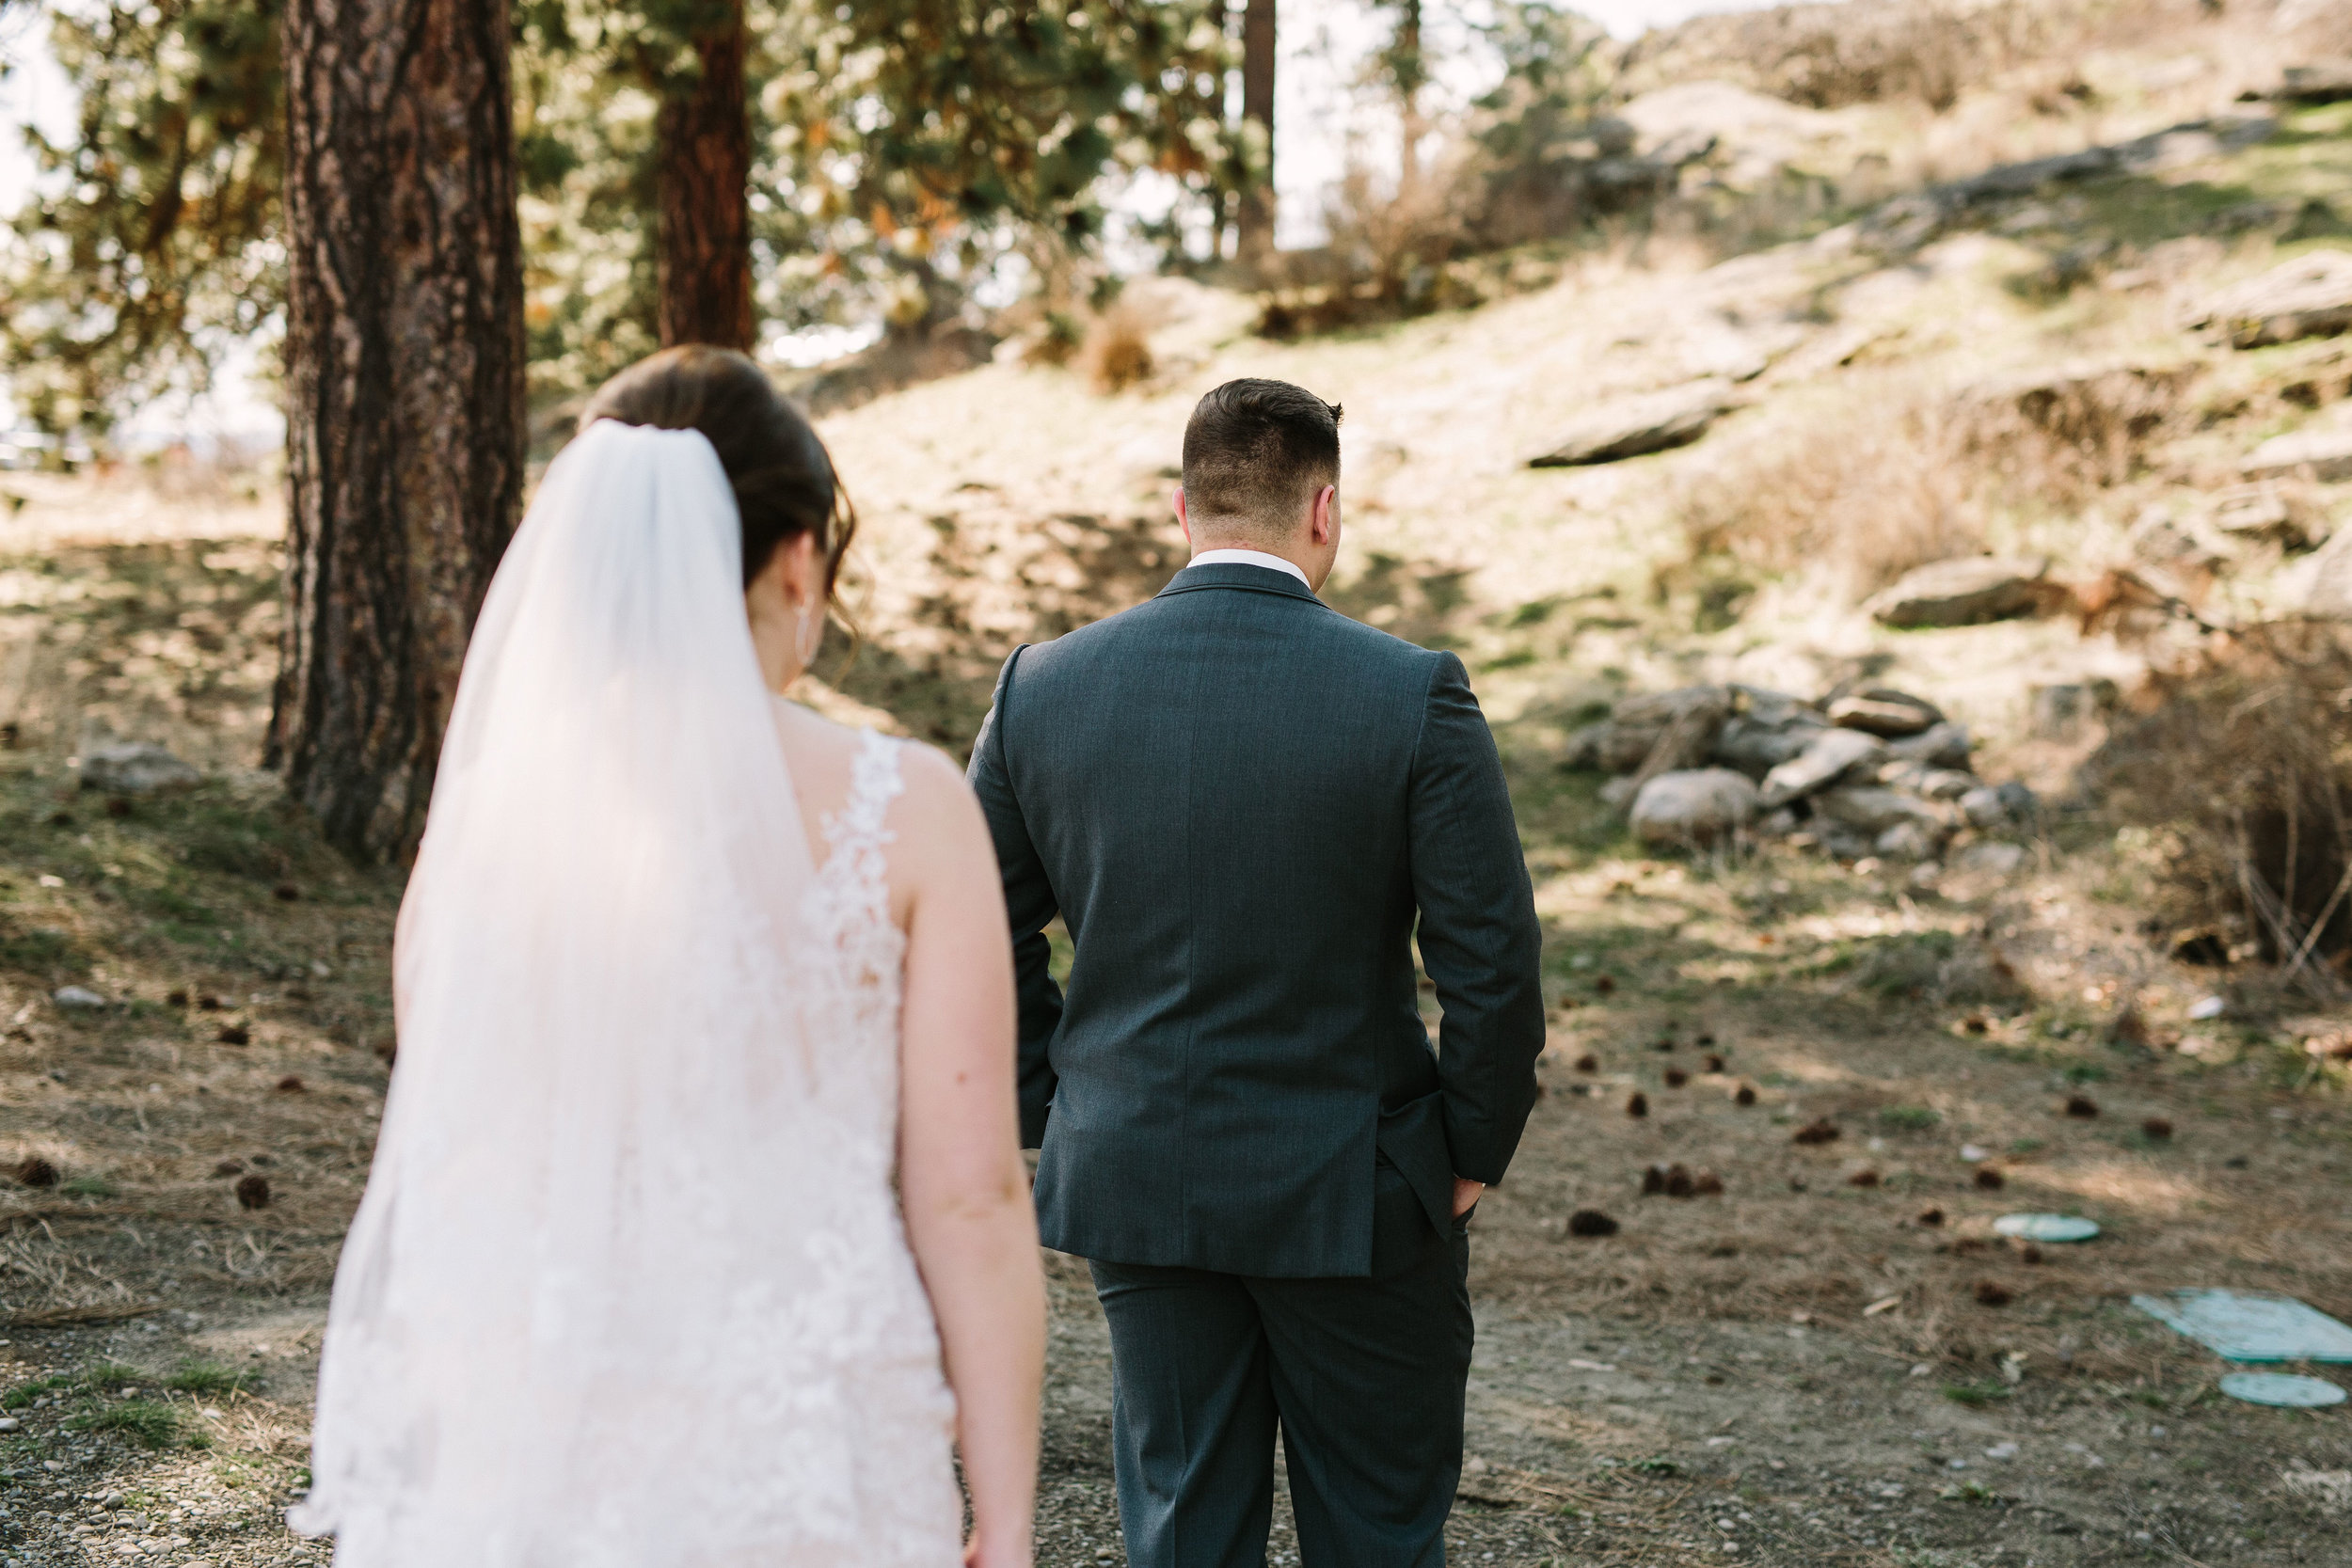 Fun Rustic spokane wedding first look in woods